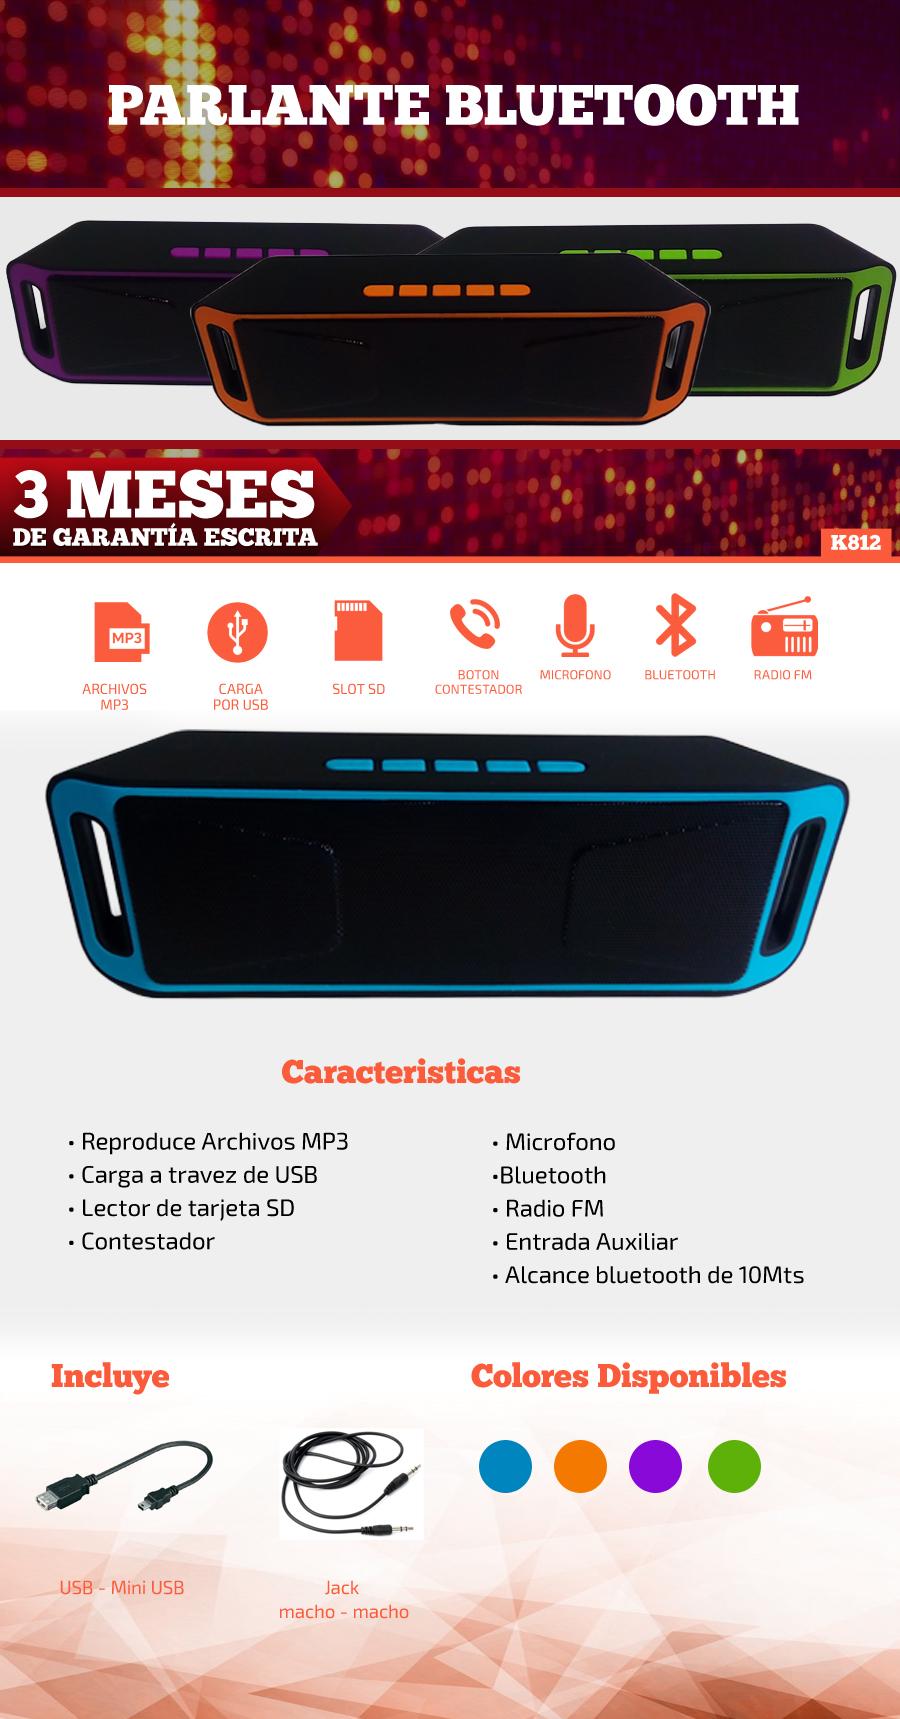 Parlante Bluetooth Funcion Radio  FM | K812 |